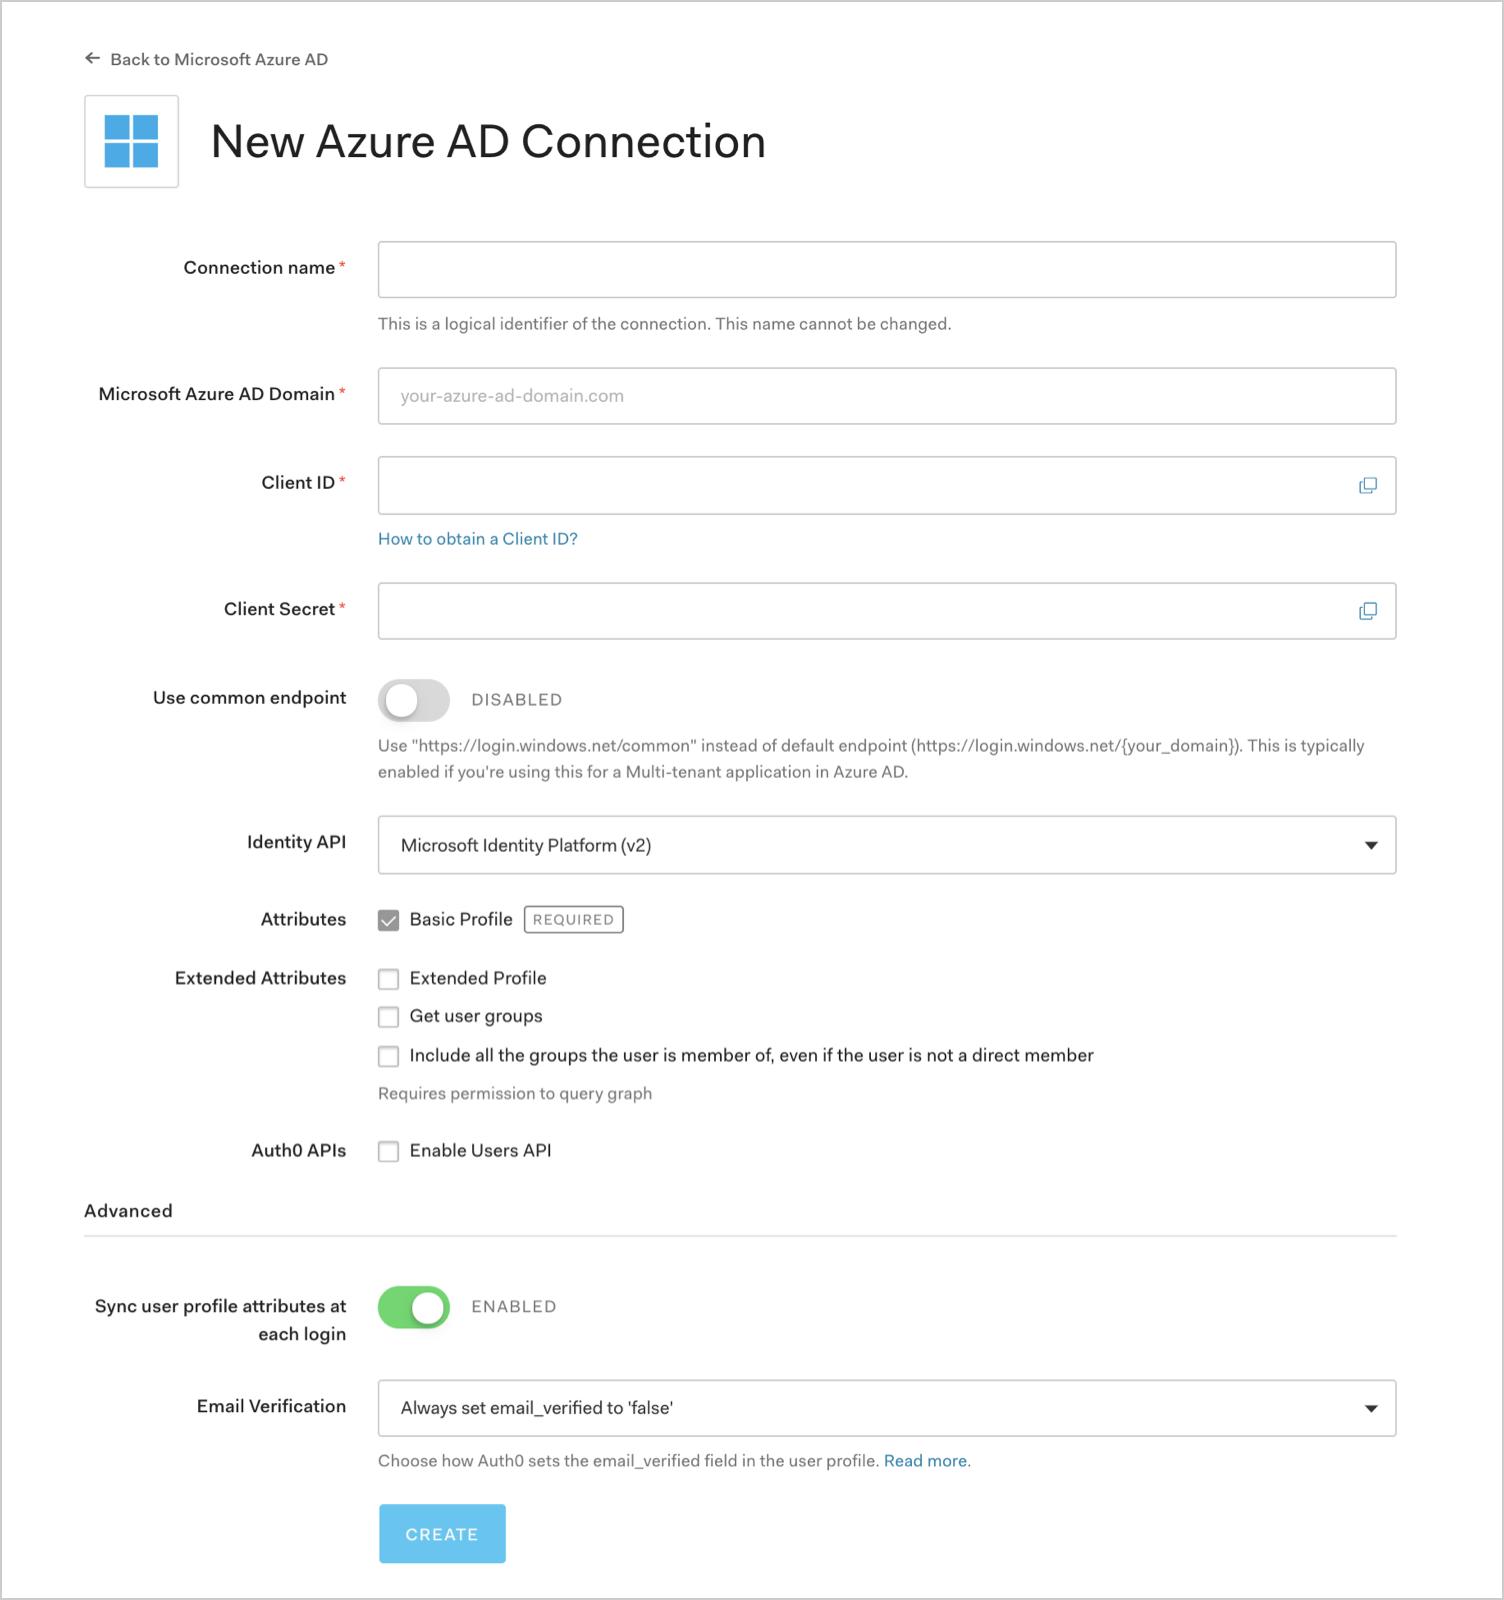 Configure Microsoft Azure AD Settings